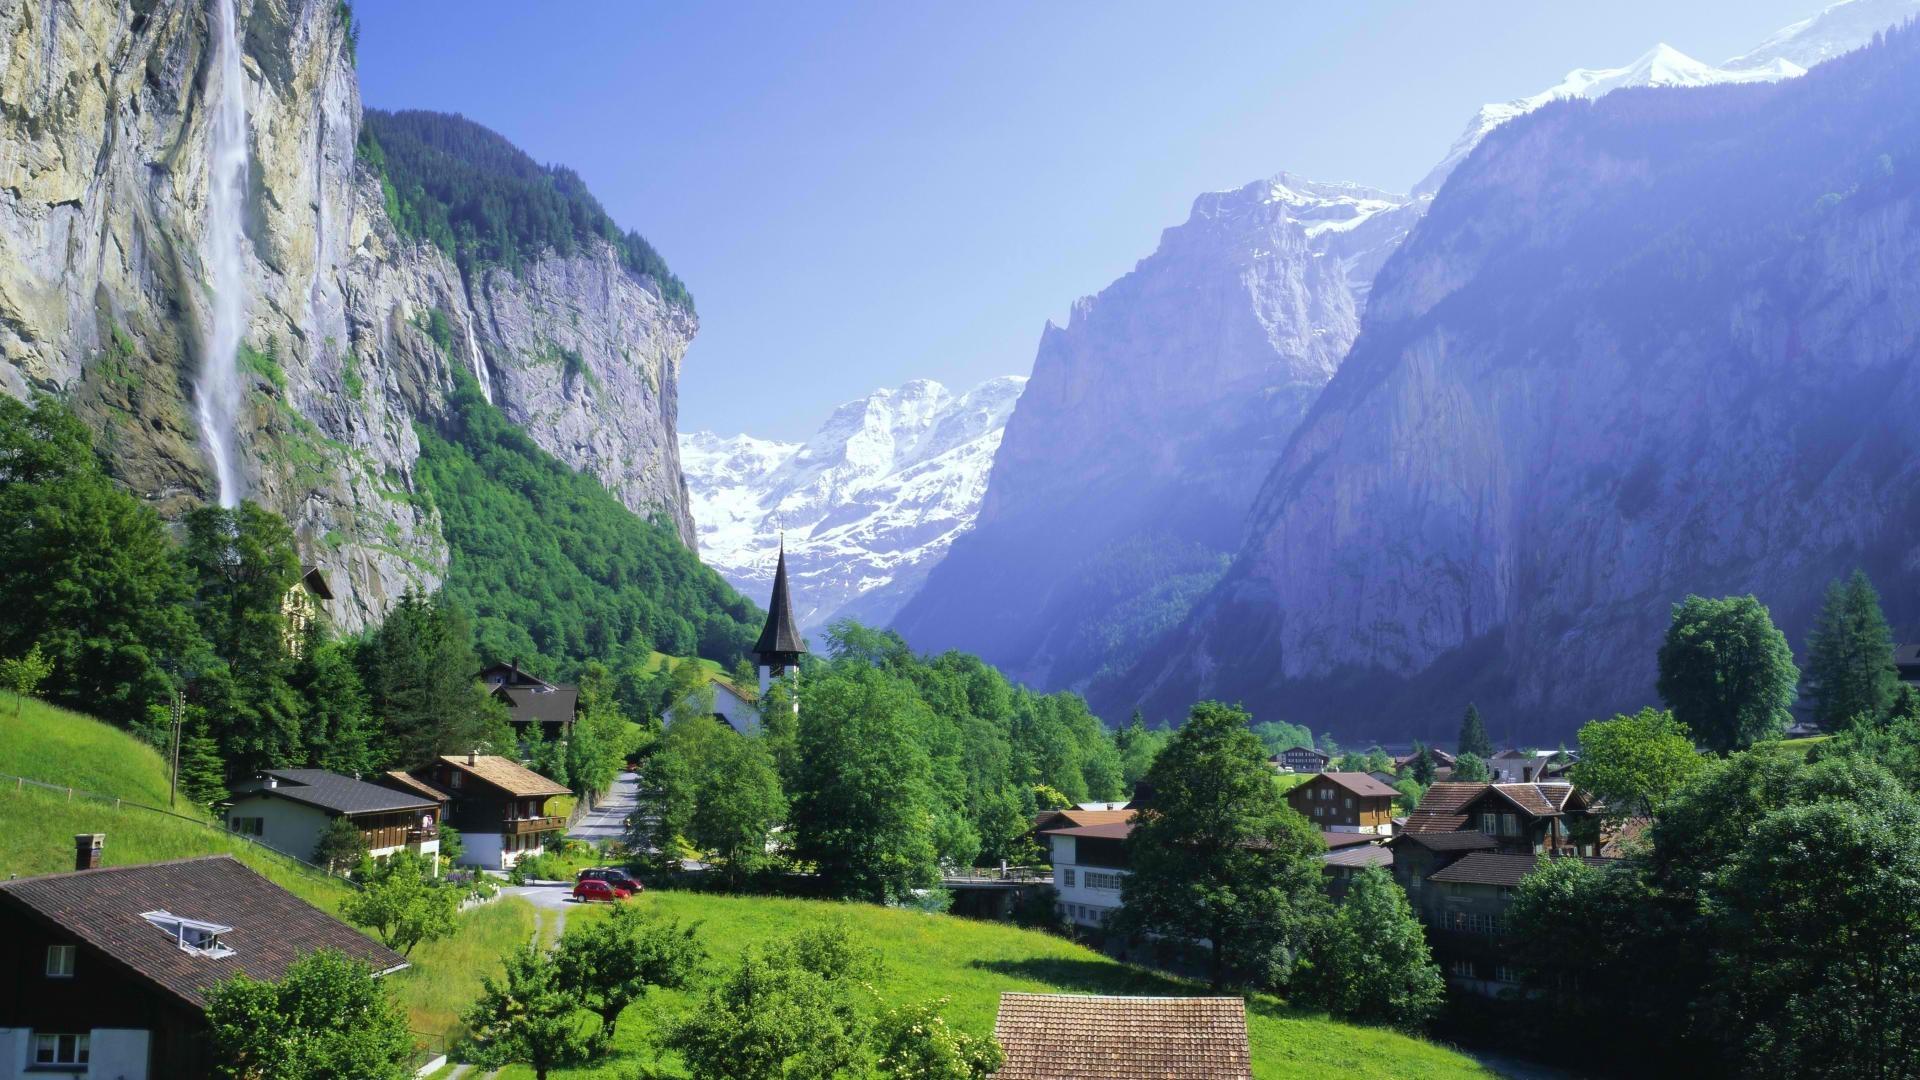 Switzerland wallpaper 69 images - Switzerland wallpaper full hd ...